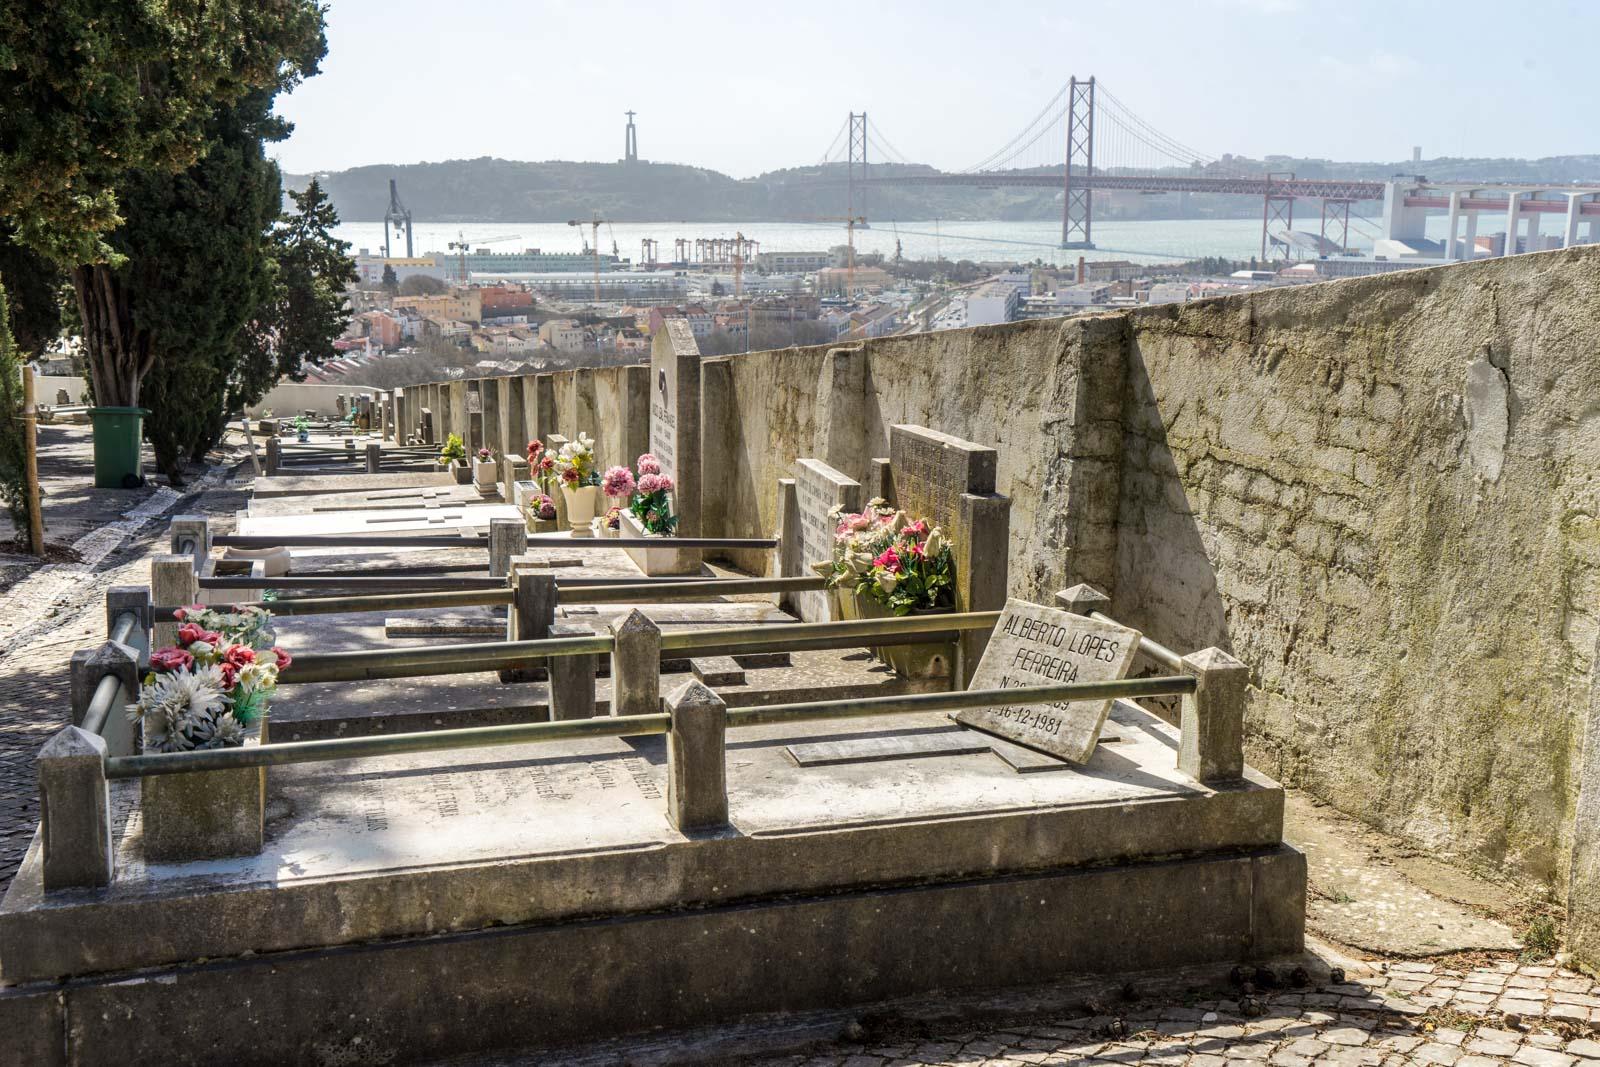 Prazeres Cemetery, Lisbon